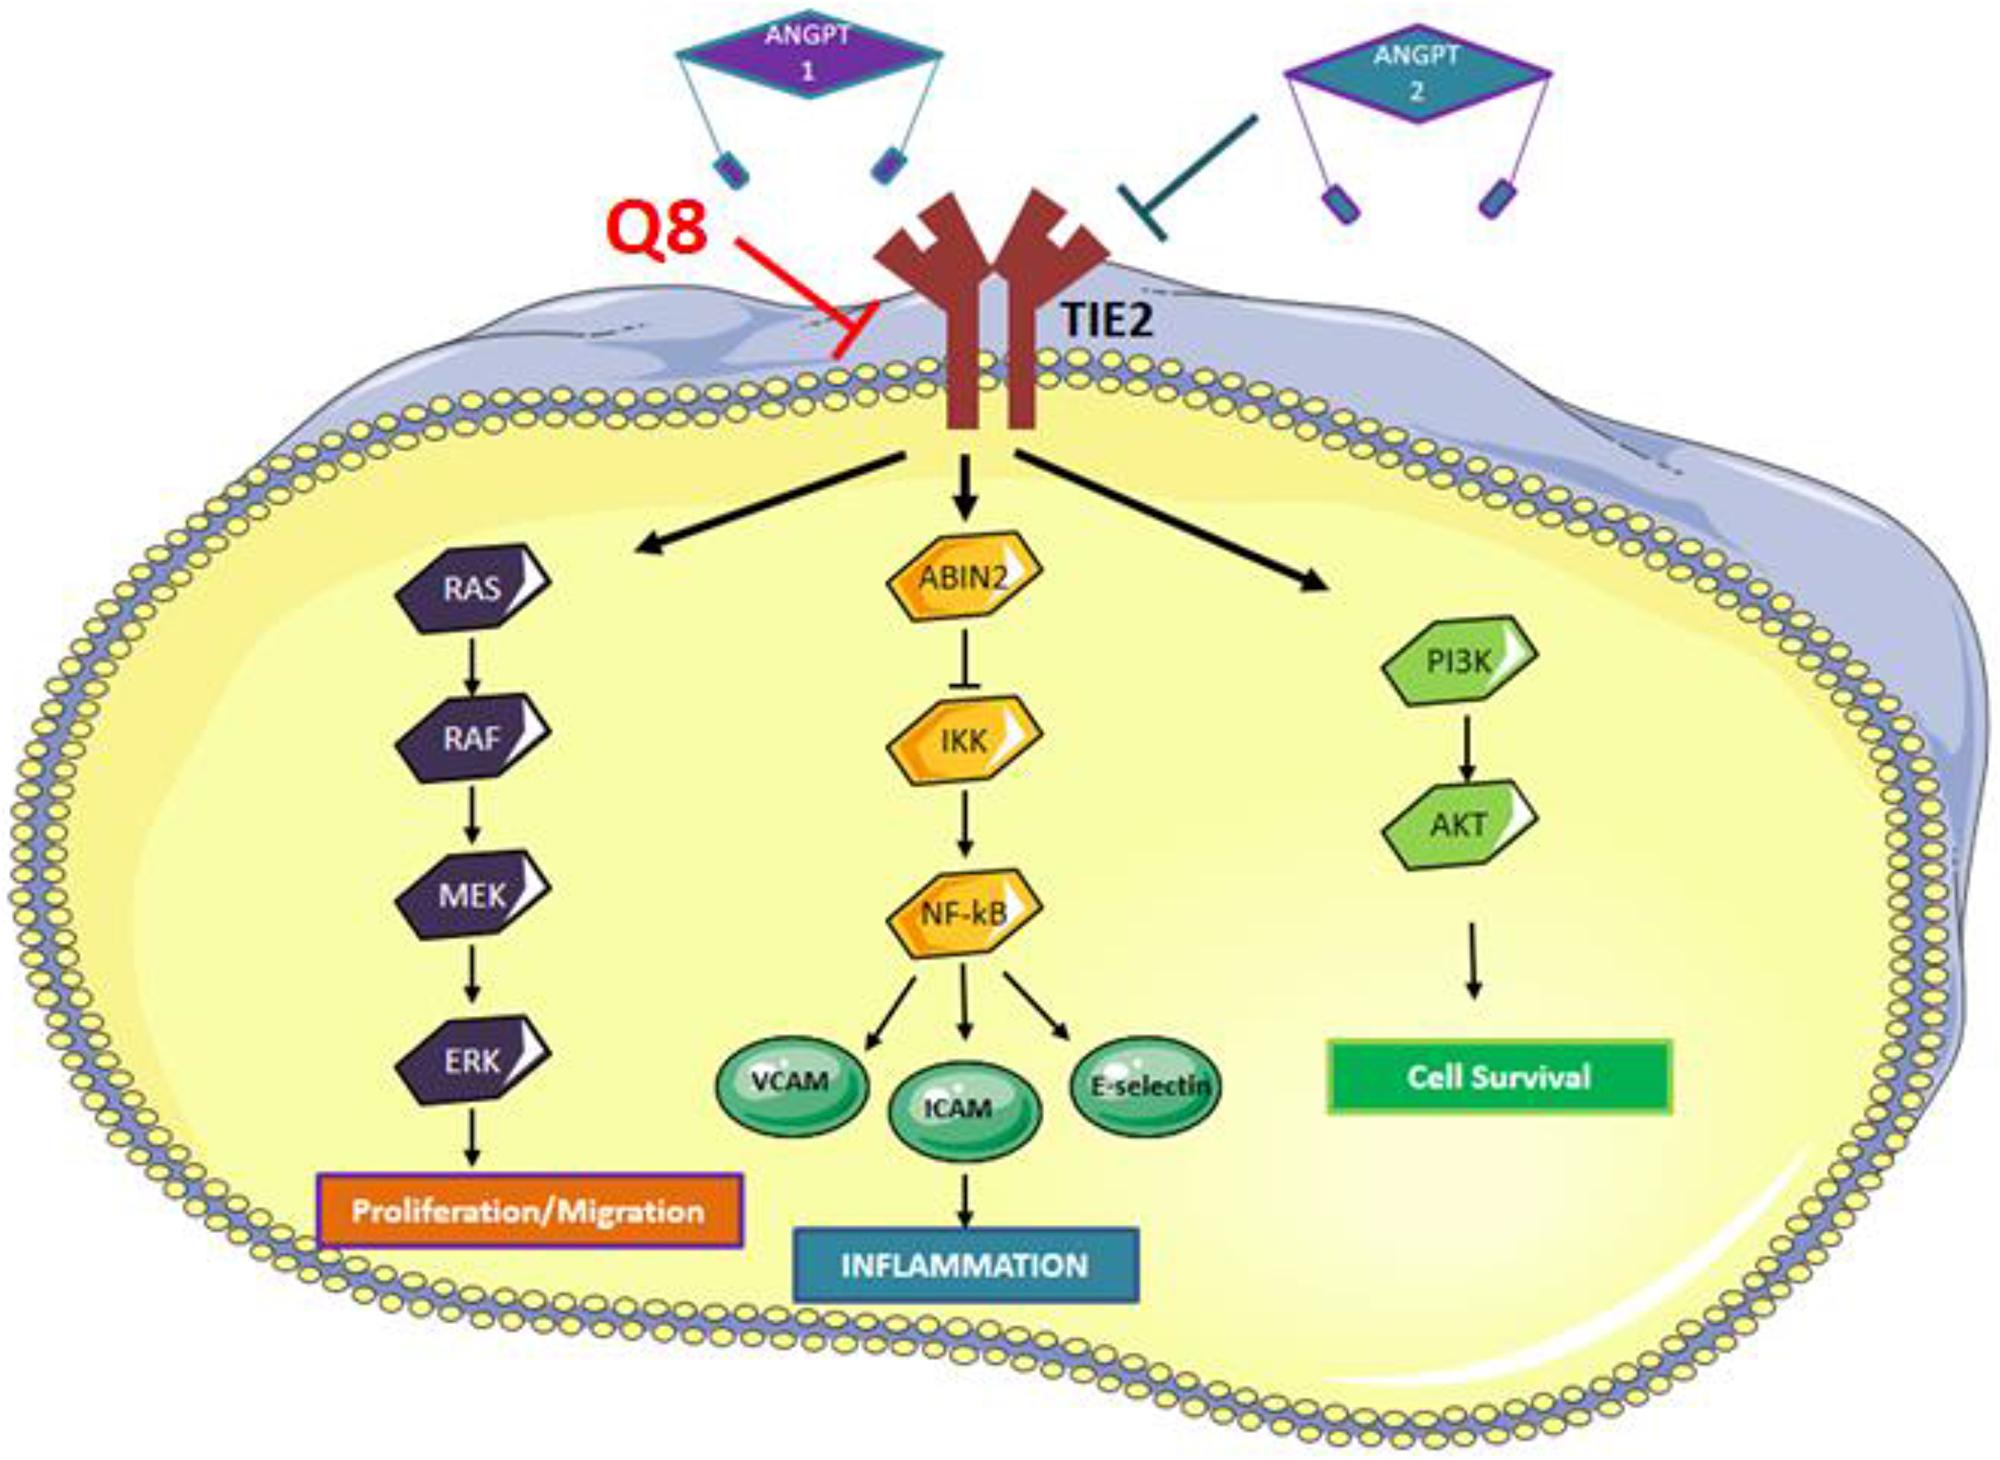 Angiopoietin-TIE signaling pathway.